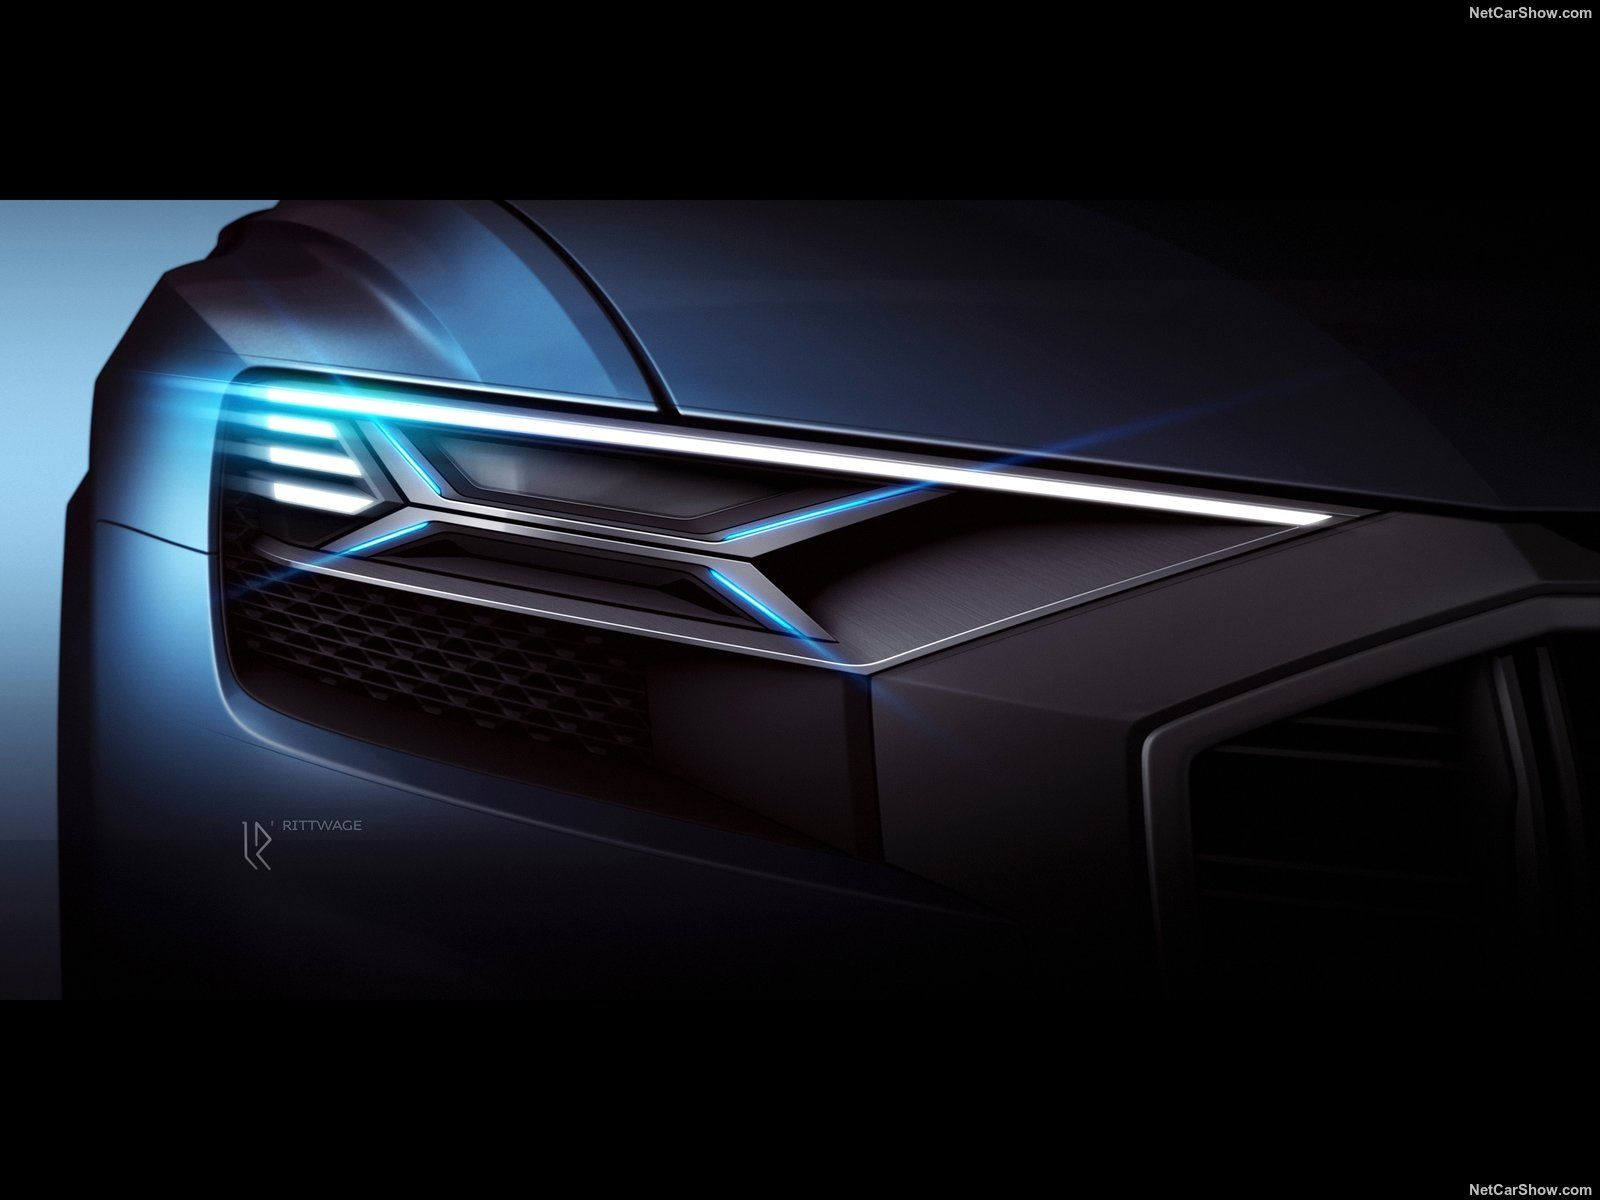 Pin By Christoph Haussinger On L Headlamp Design Car Headlights Automotive Design